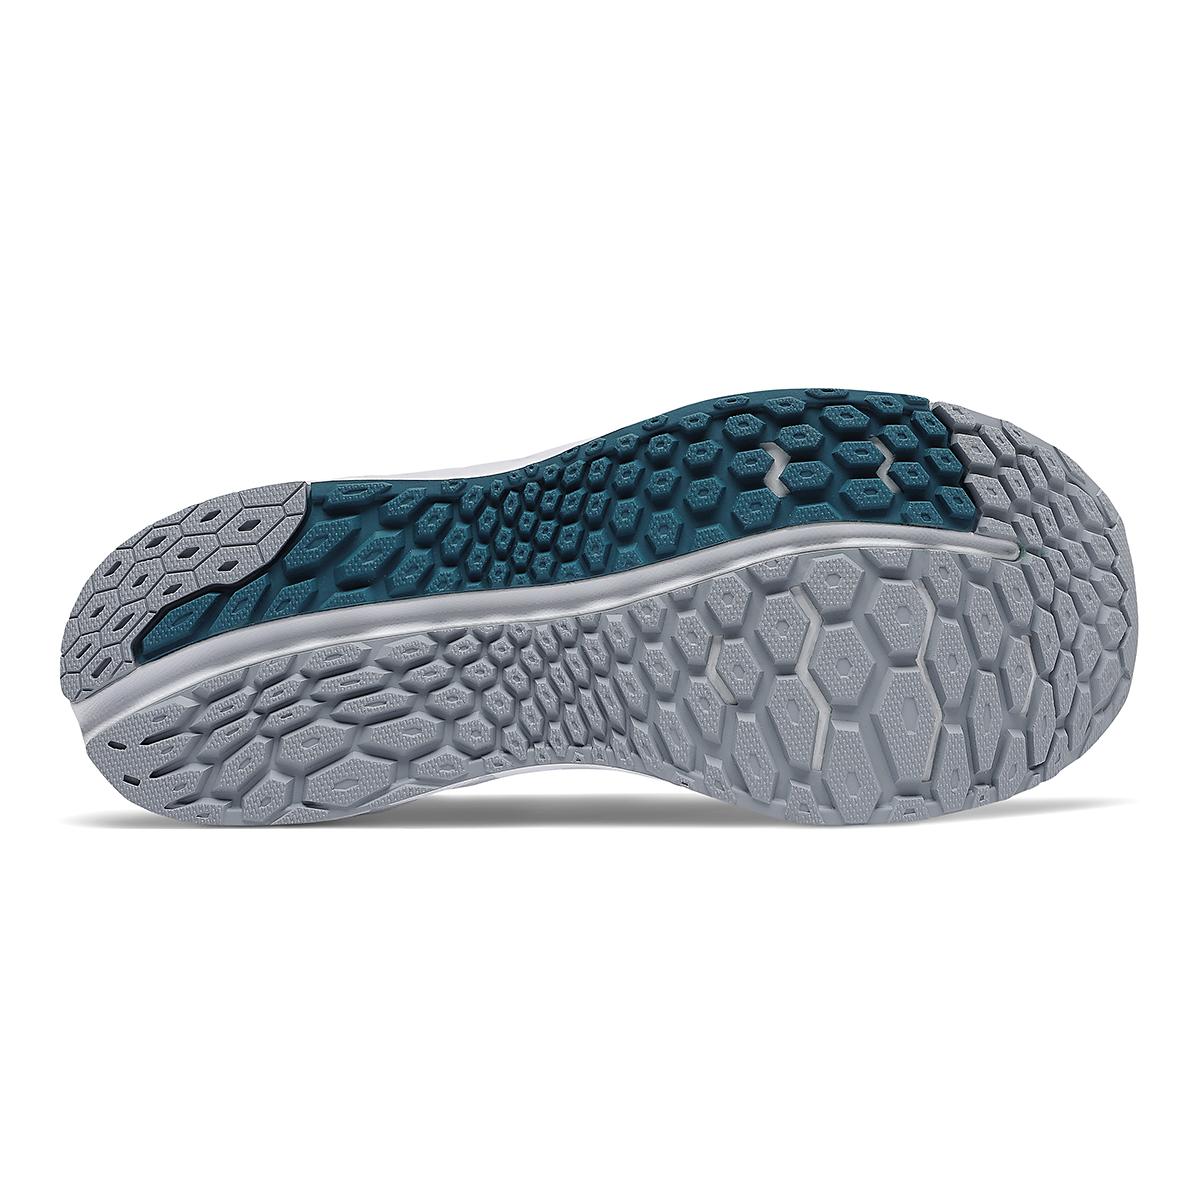 Men's New Balance Vongo V4 Running Shoe - Color: White - Size: 8 - Width: Regular, White, large, image 4